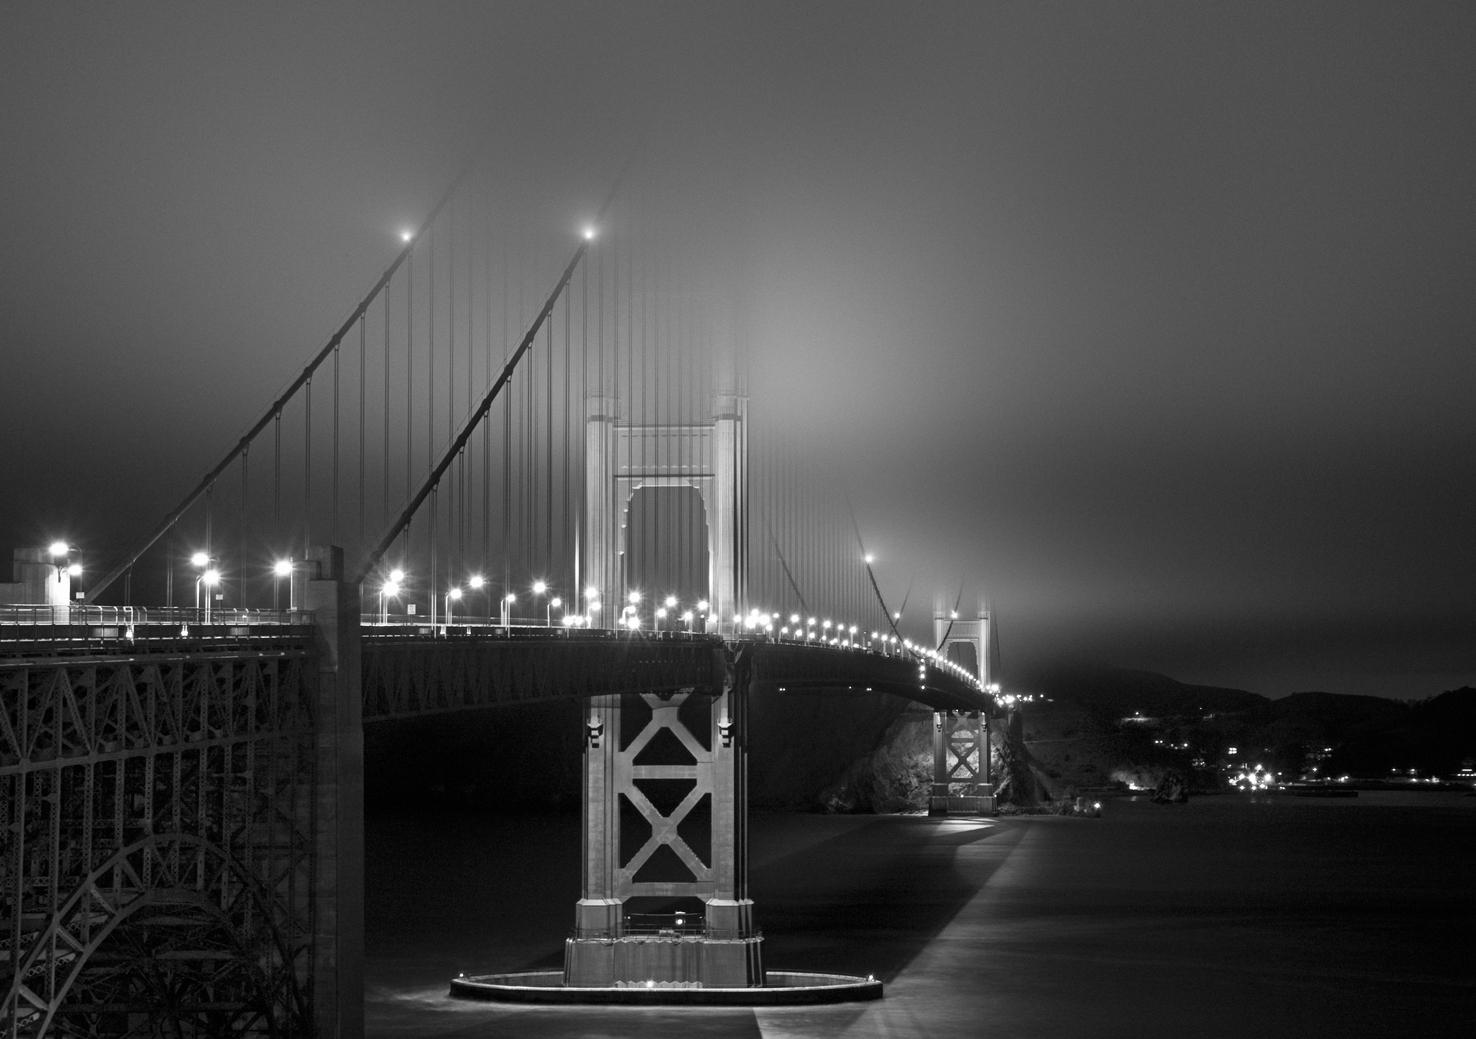 The GoldenGateBridge at Night